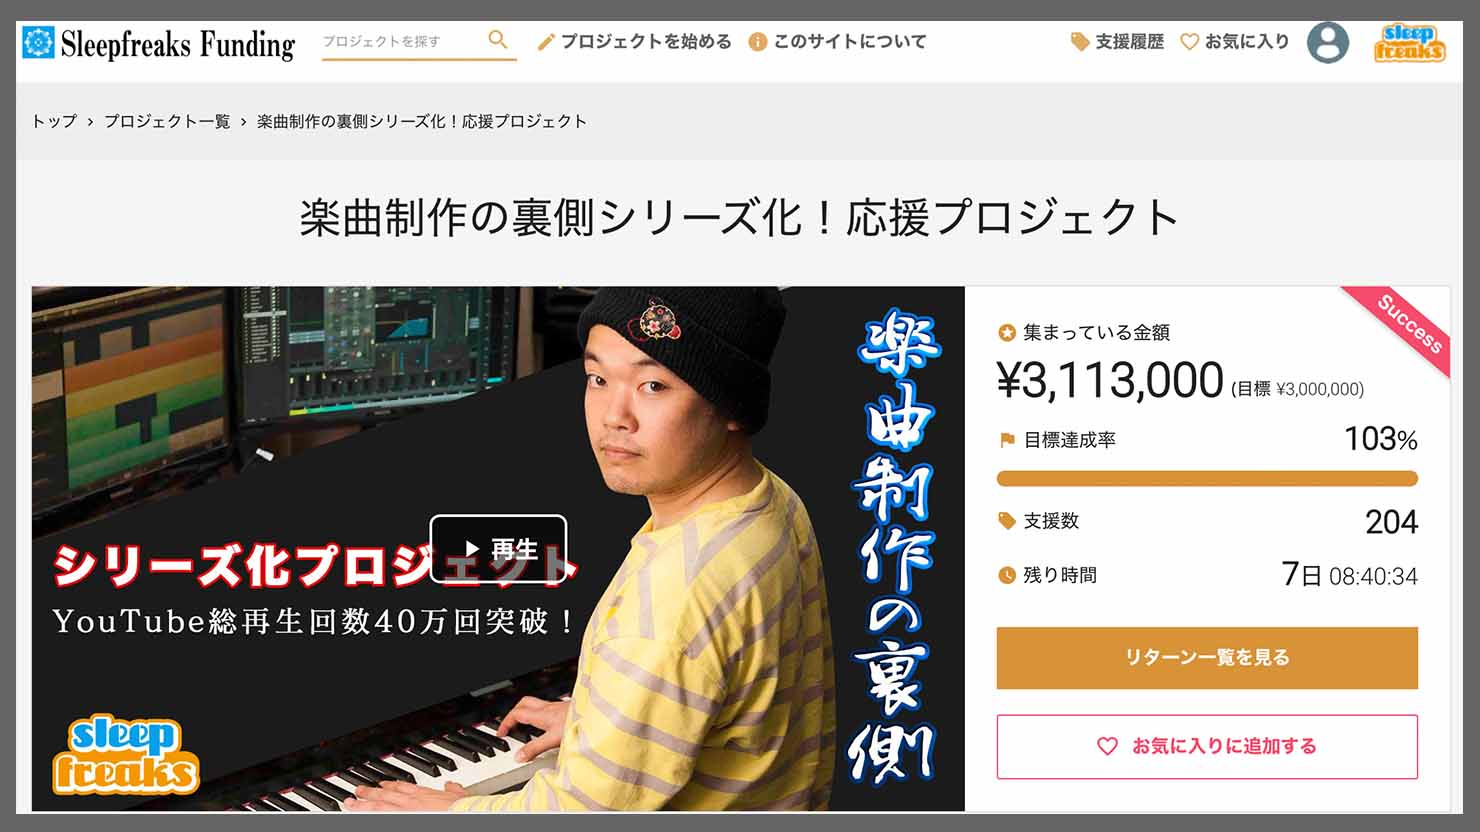 CrowdFunding-shirato-Success-1